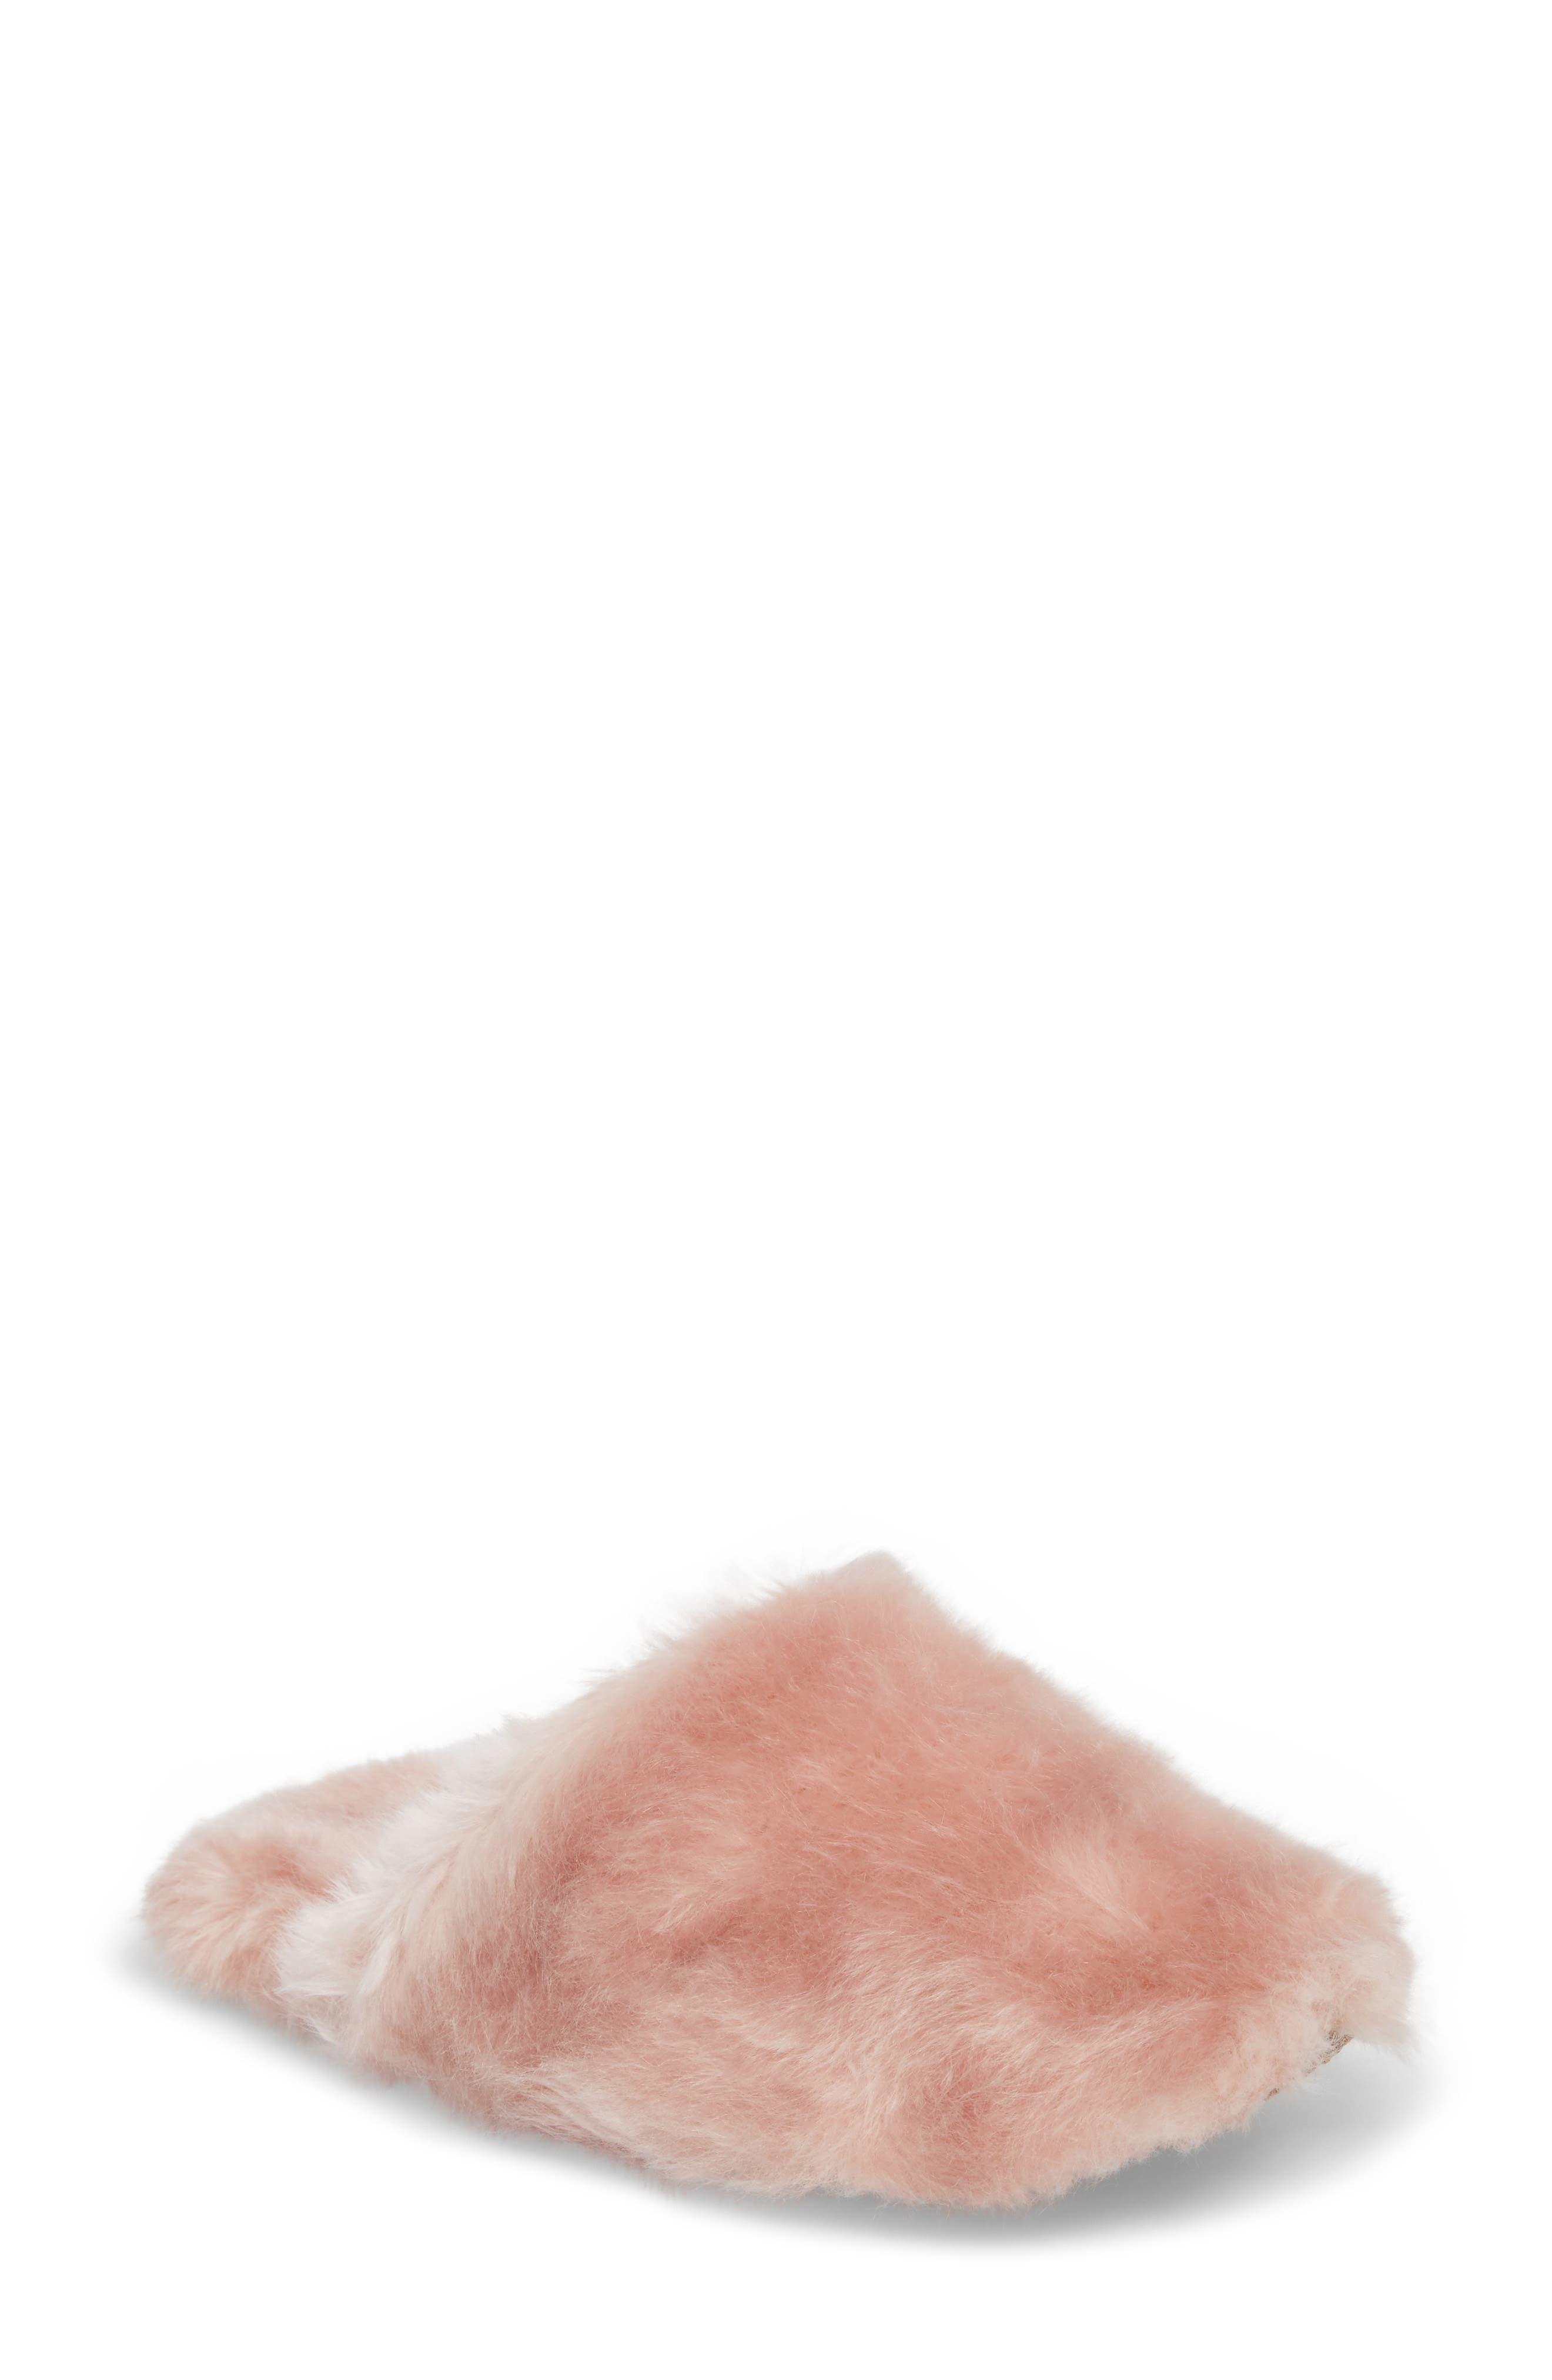 Alternate Image 1 Selected - J.Crew Faux Fur Slipper (Women)